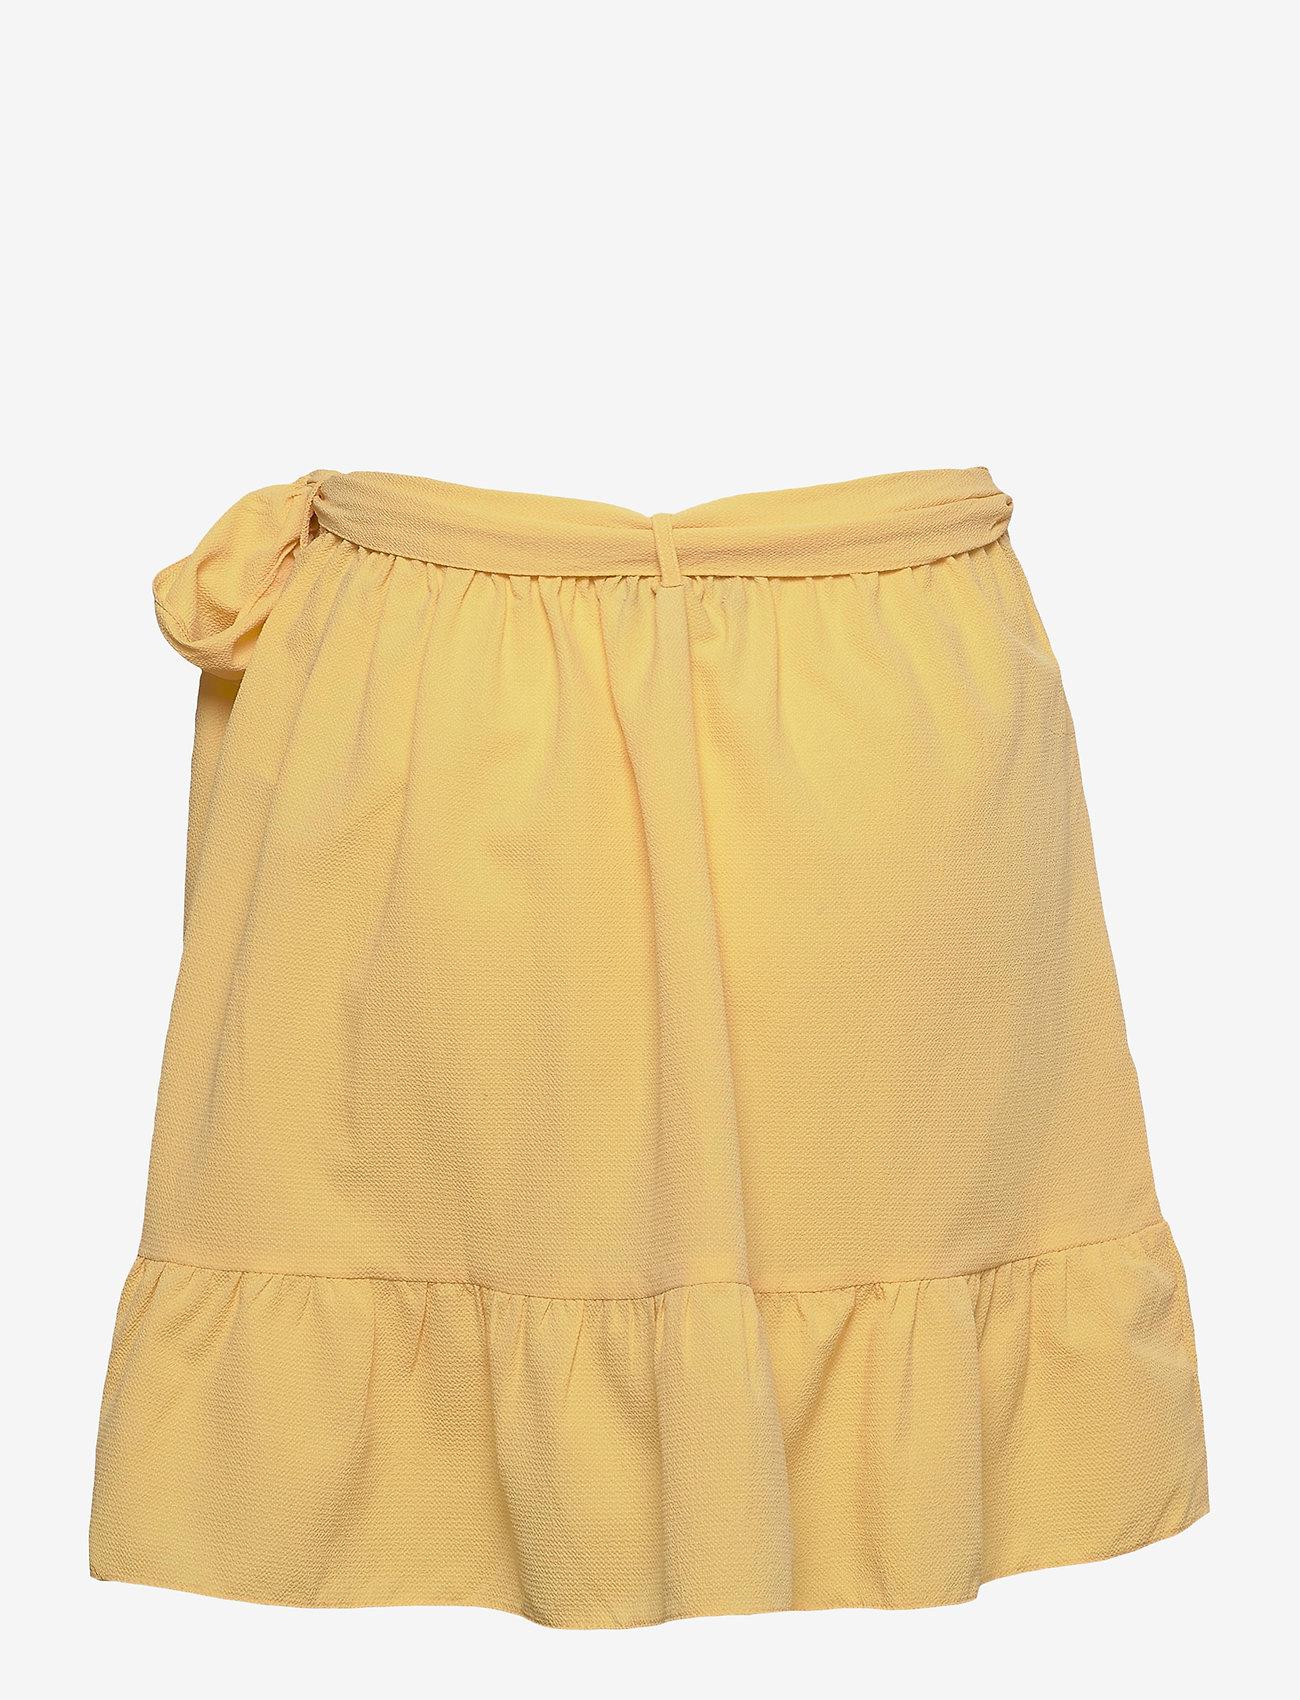 Vero Moda - VMCITA BOBBLE WRAP SKIRT COLOR - korta kjolar - cornsilk - 1